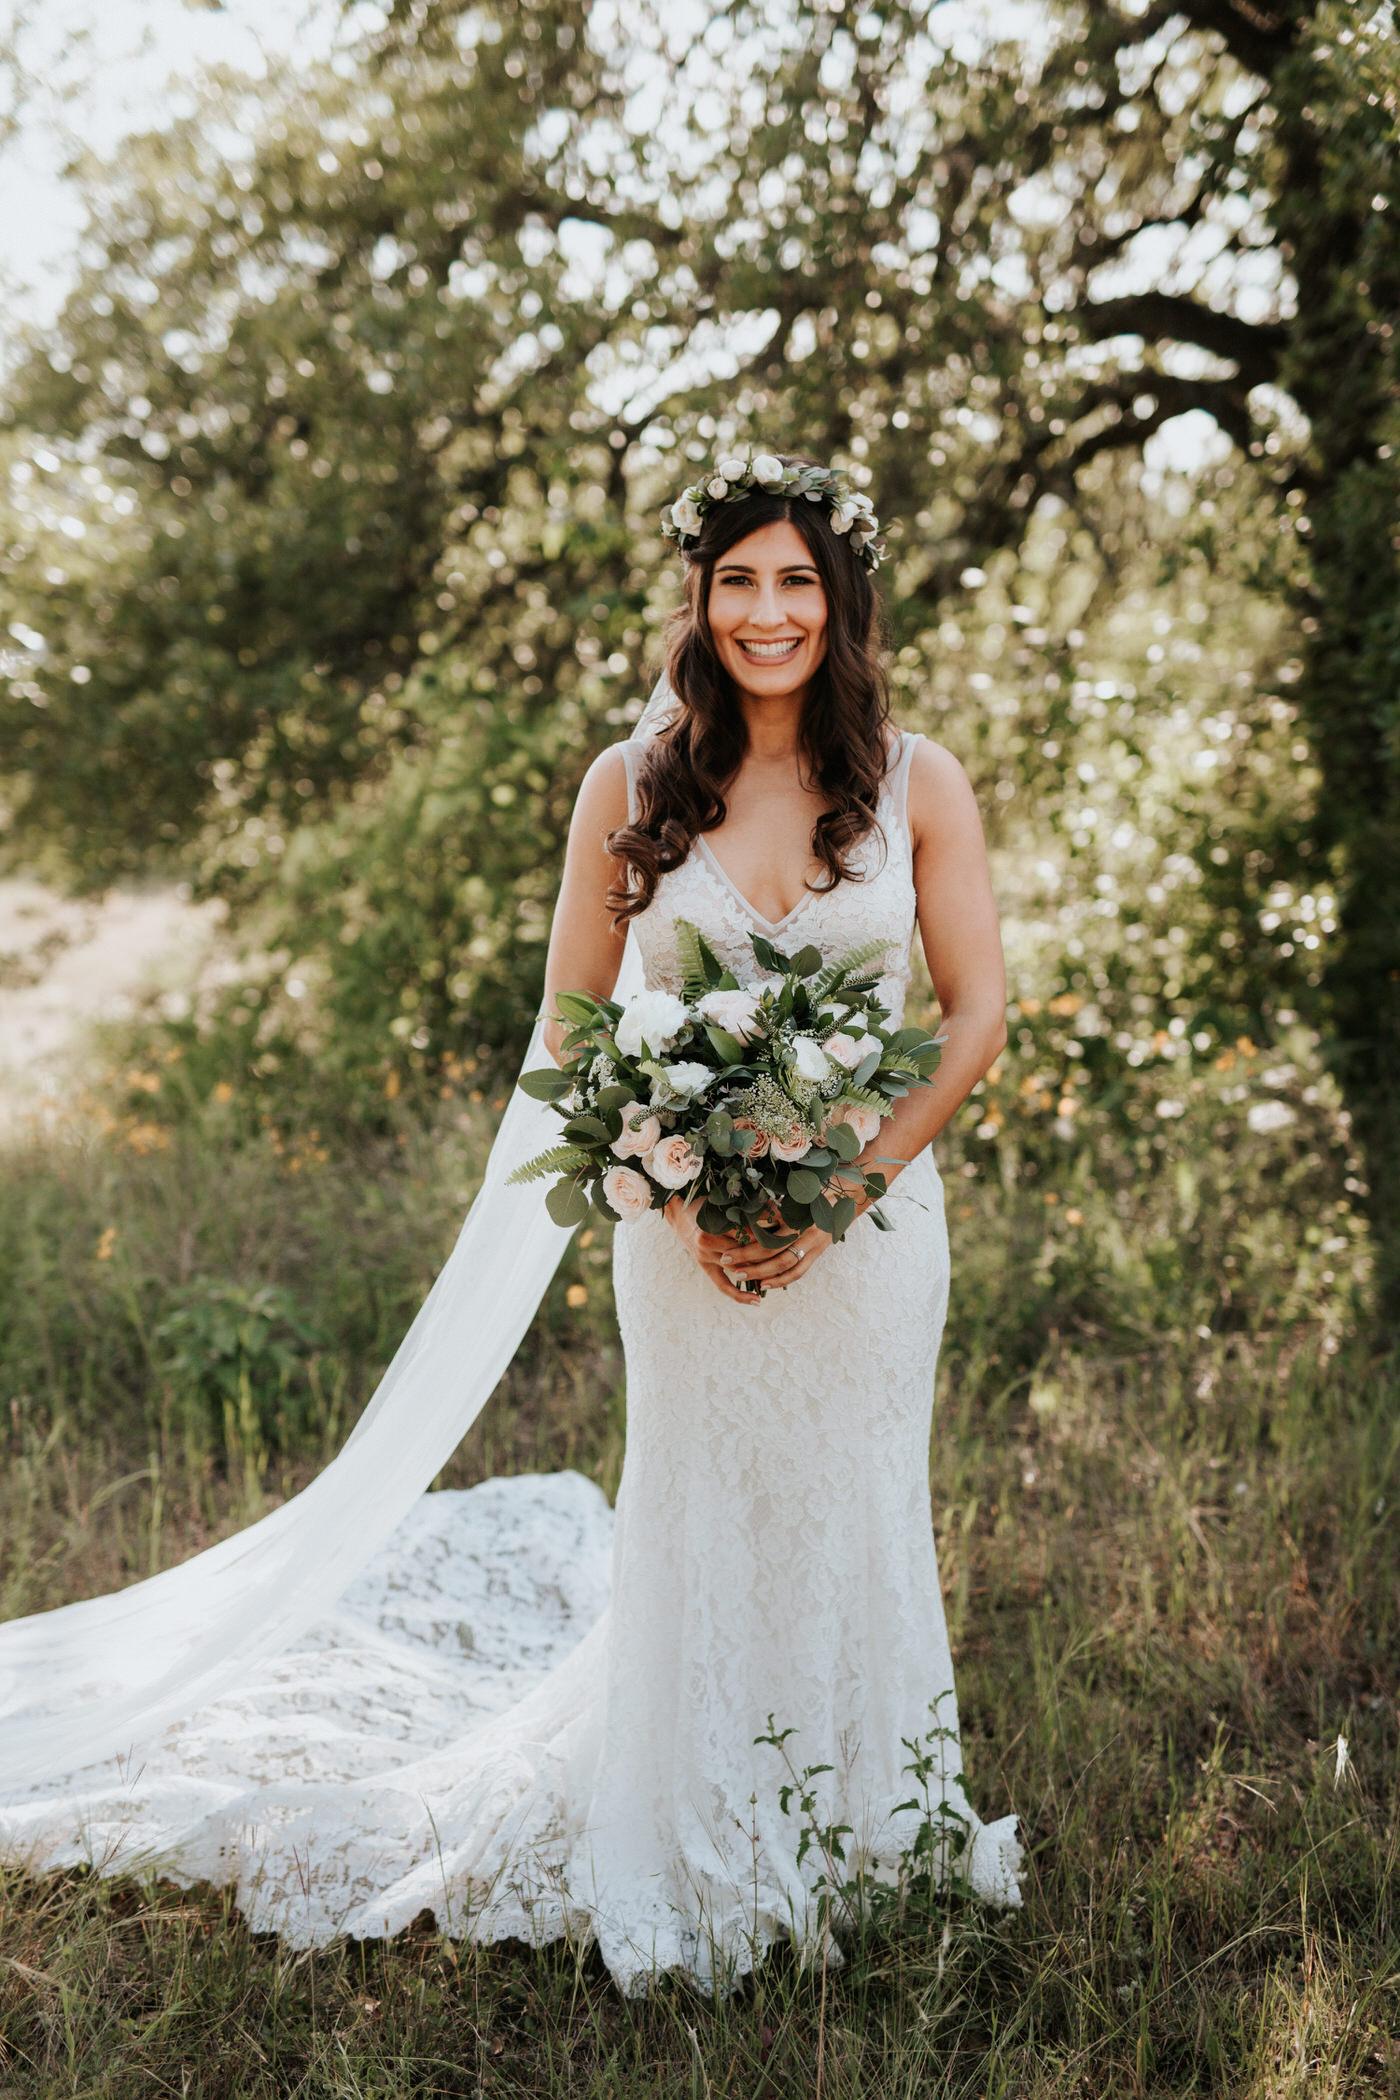 Bride at Thurman's Mansion wedding